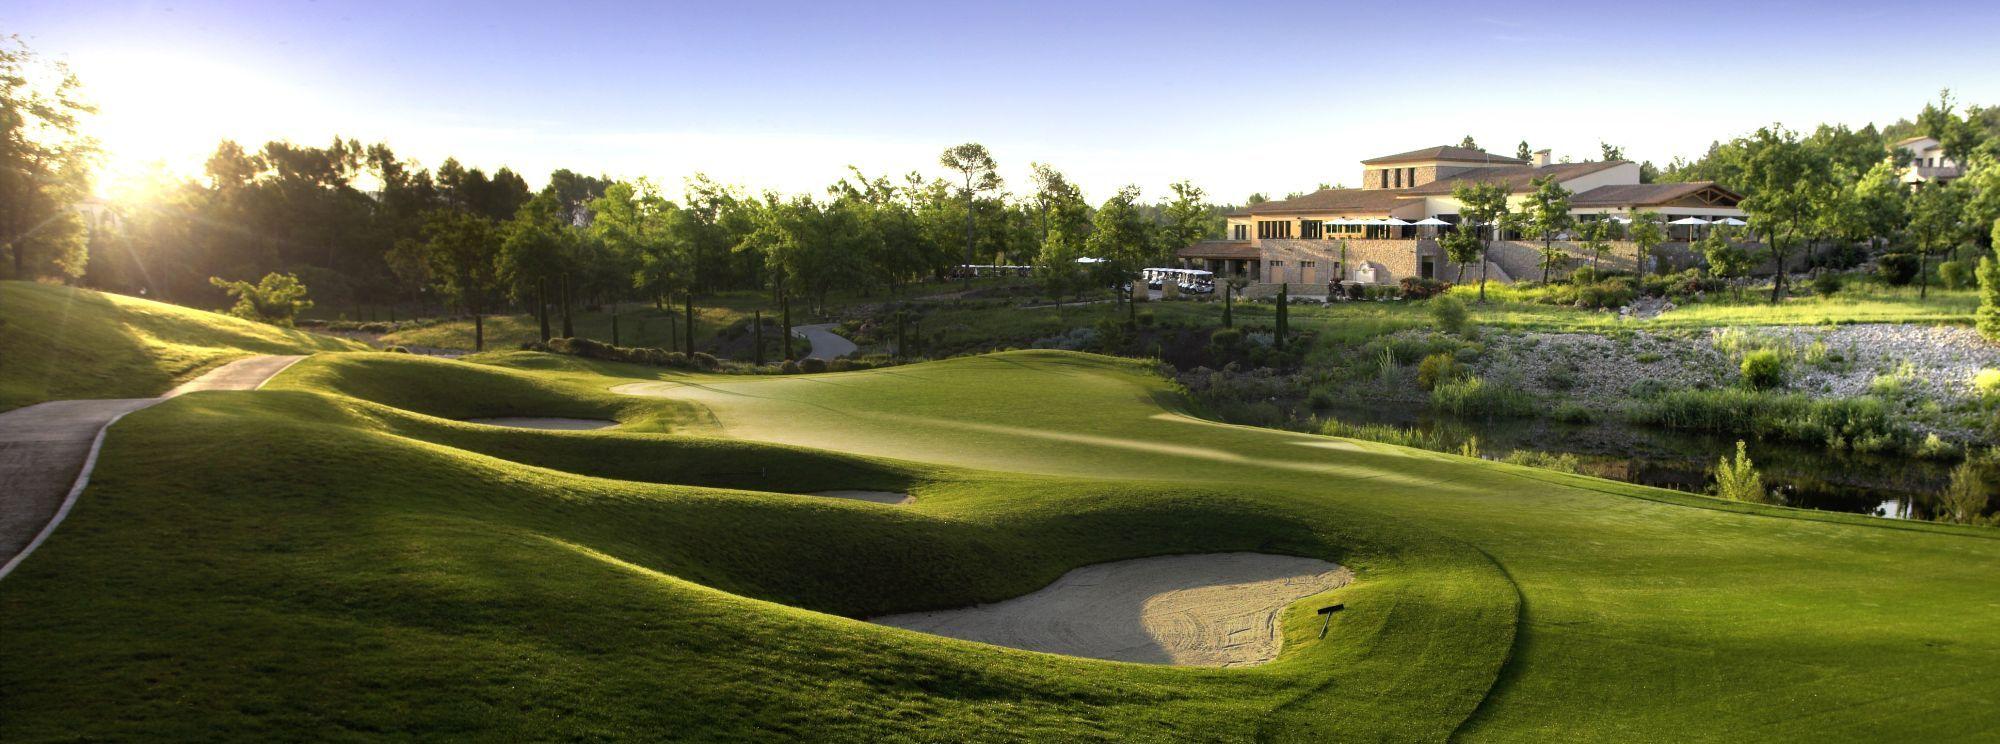 golf-expedition-golfreizen-europa-zuid-afrika-beste-golfbanen-golfervaring-mooie-locaties